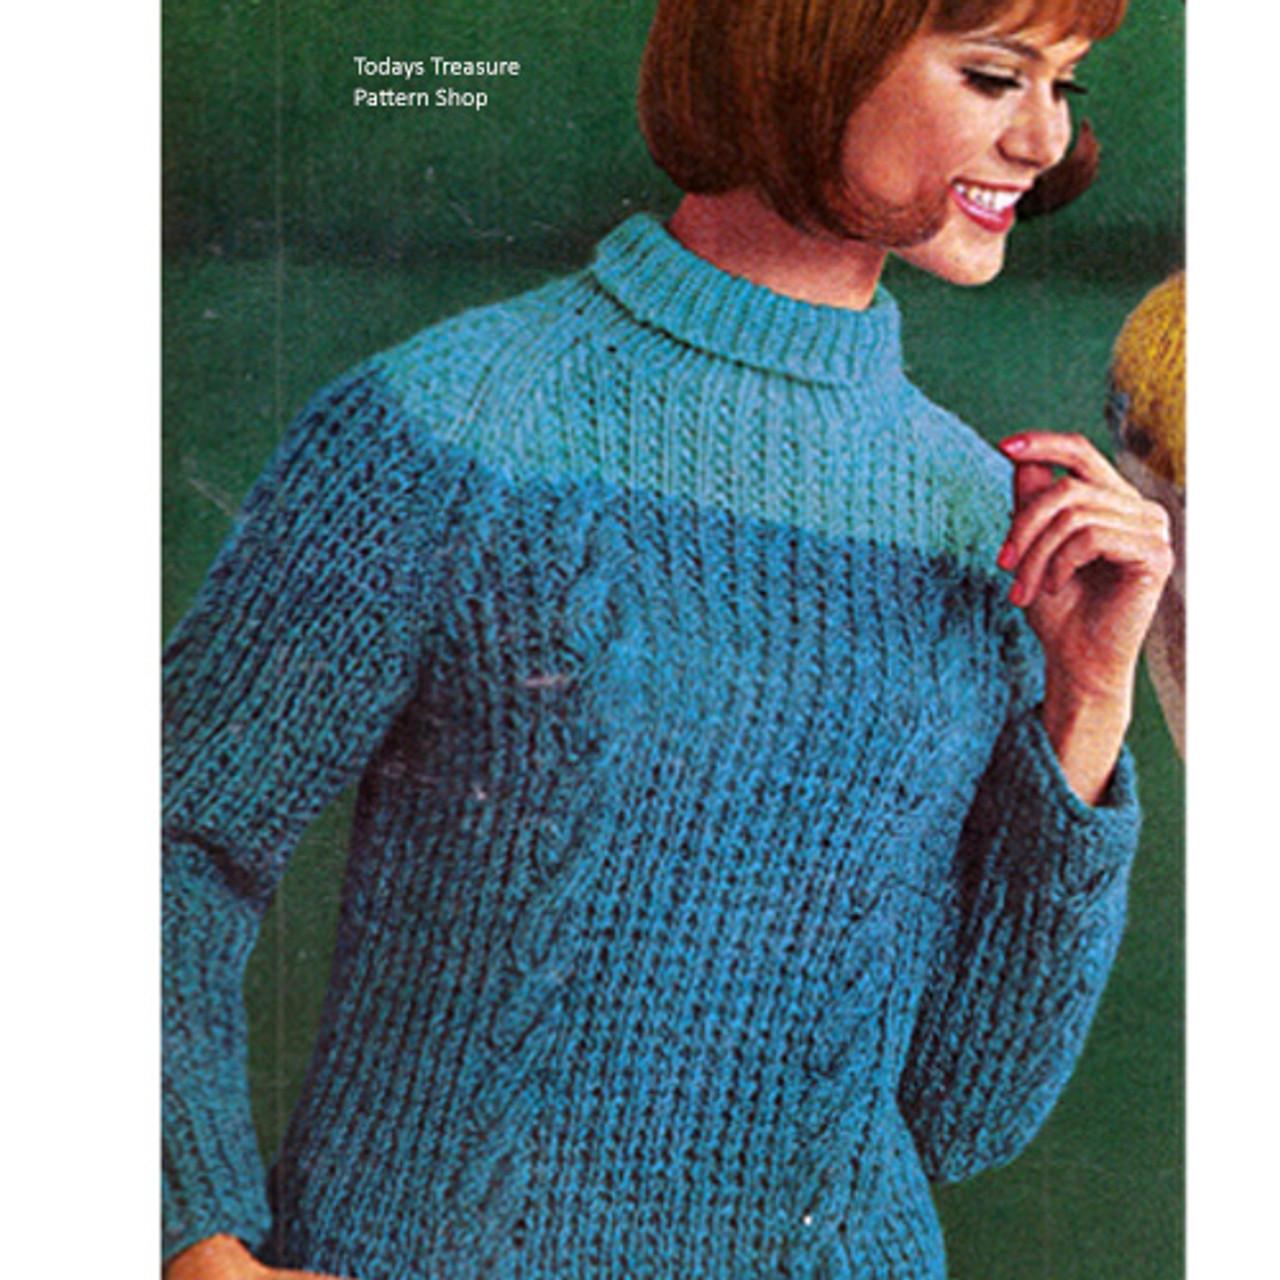 Spinnerin Alpine Knitted Sweater Pattern